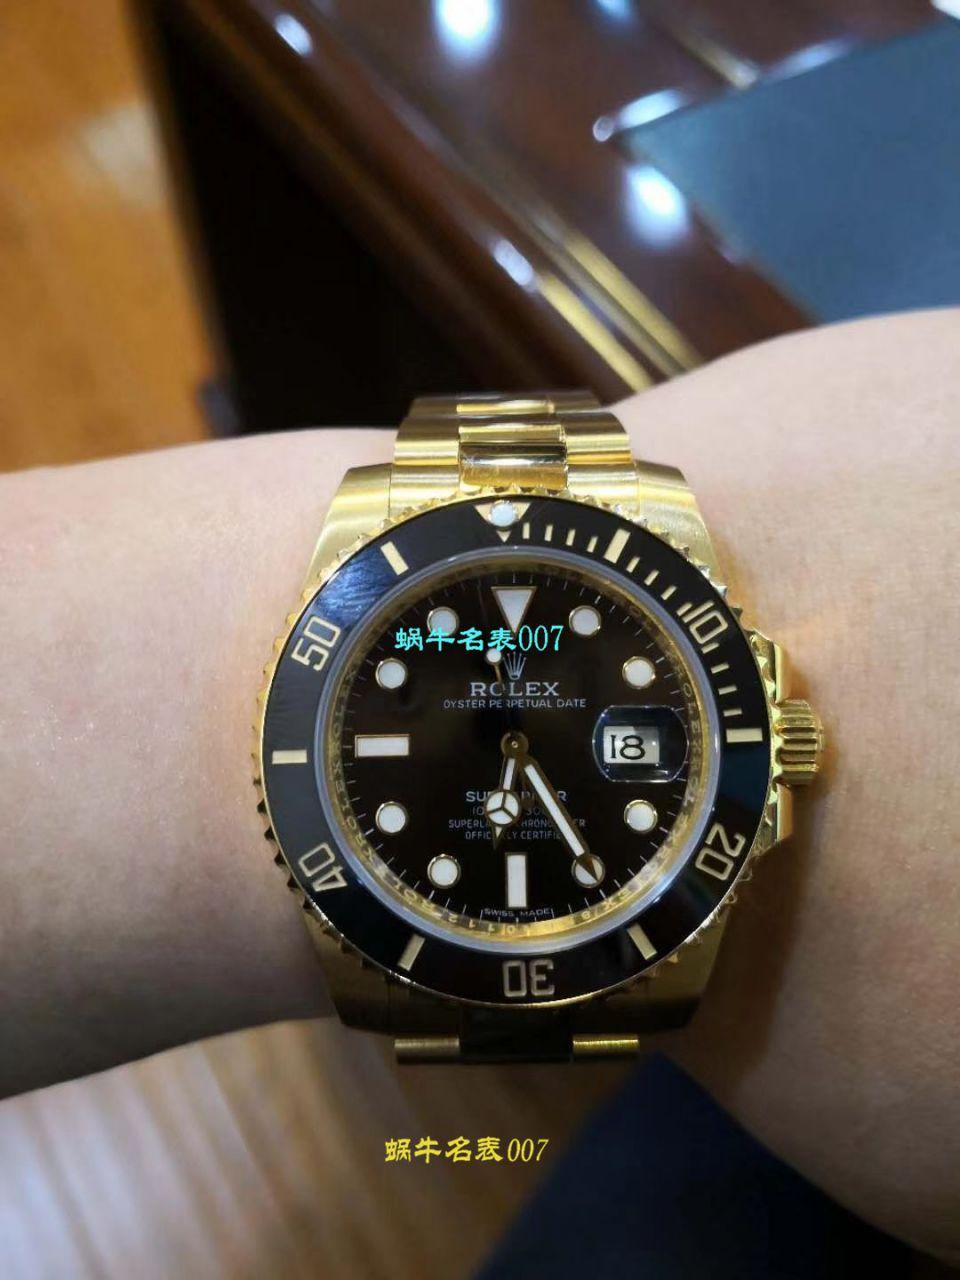 【VR一比一超A高仿手表土豪全18K包金黑水鬼~】劳力士潜航者型系列116618LN-97208 黑盘腕表